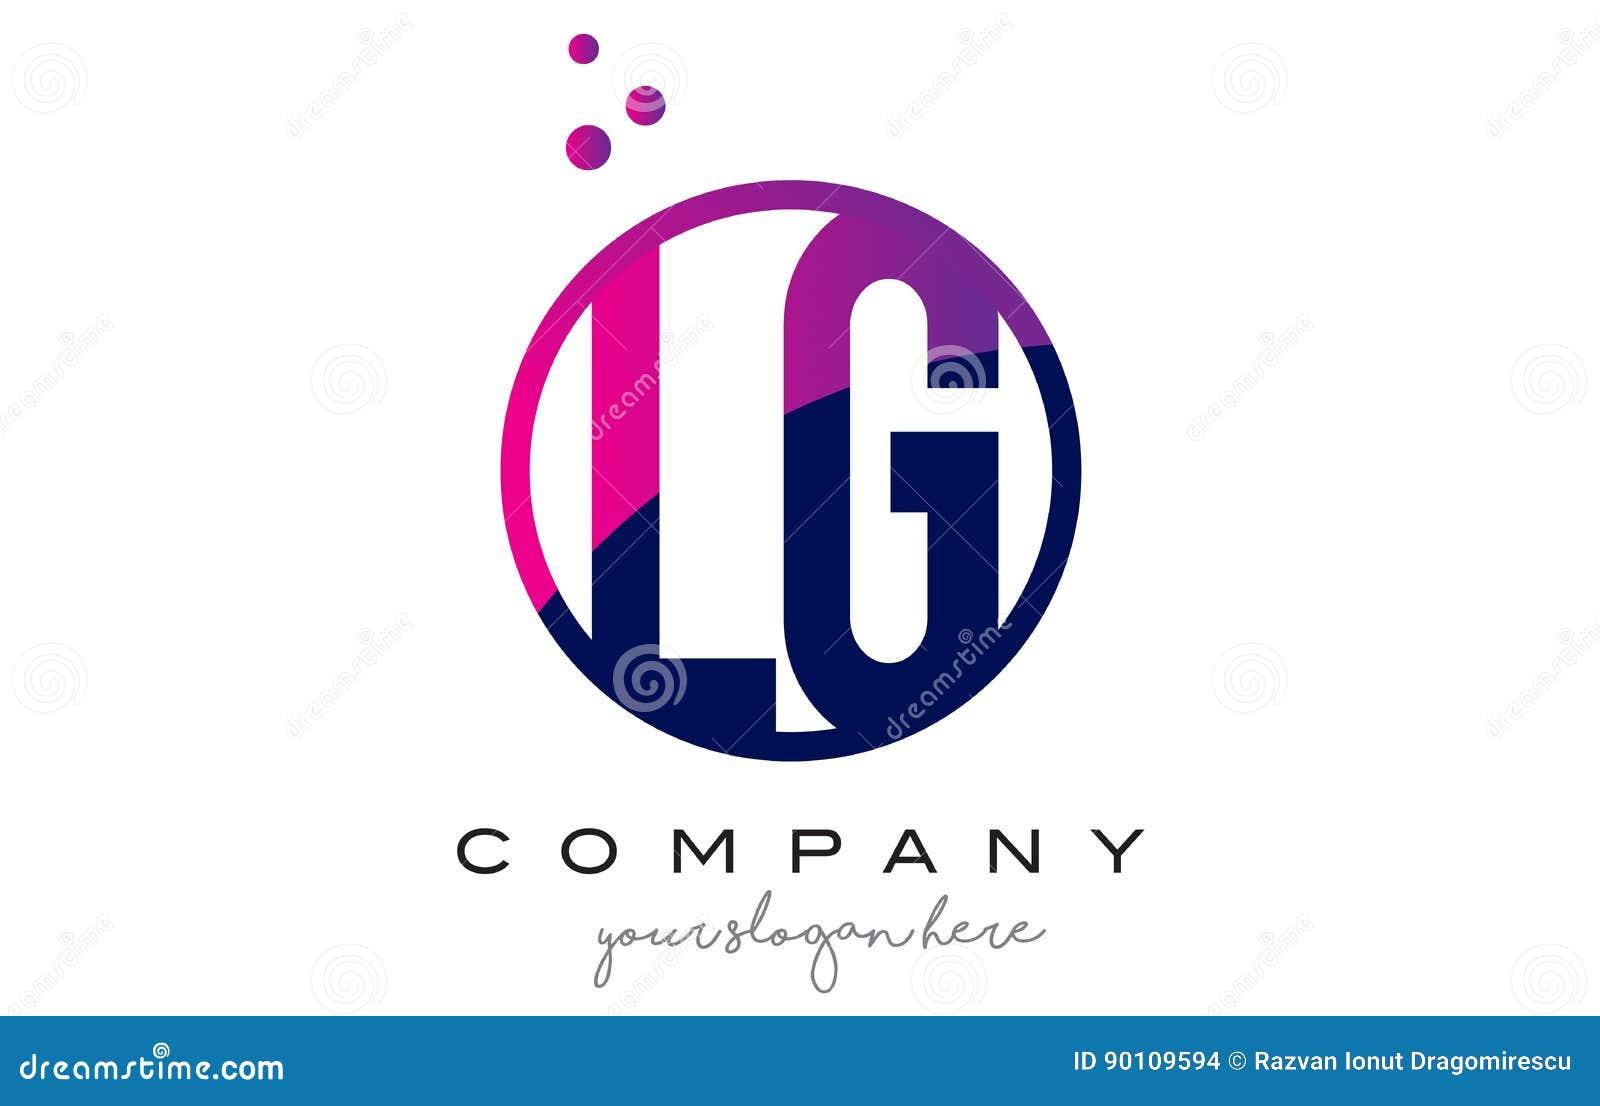 LG L G Circle Letter Logo Design With Purple Dots Bubbles Stock